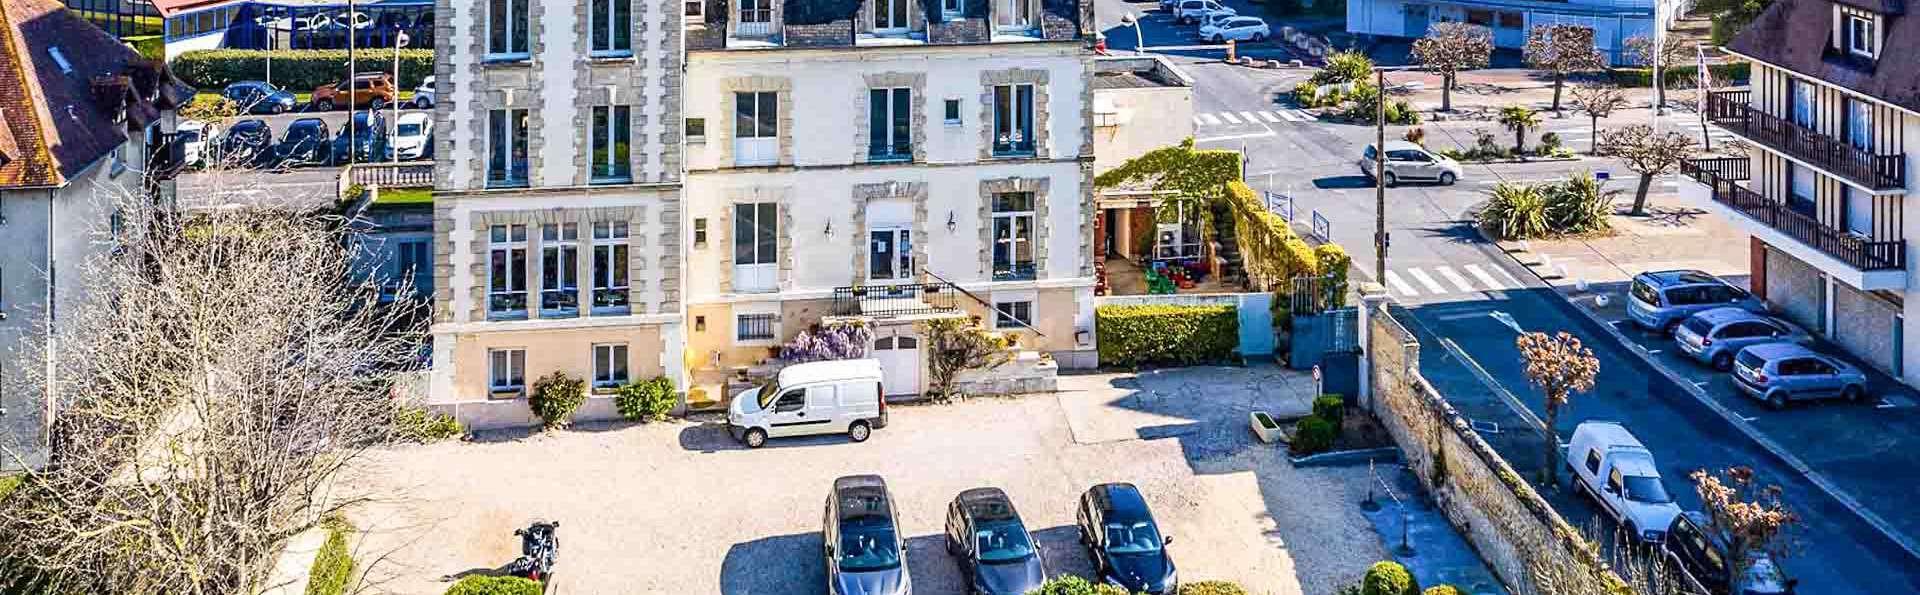 La Villa Andry  - EDIT_villa_andry-Stephane_Leroy_01.jpg